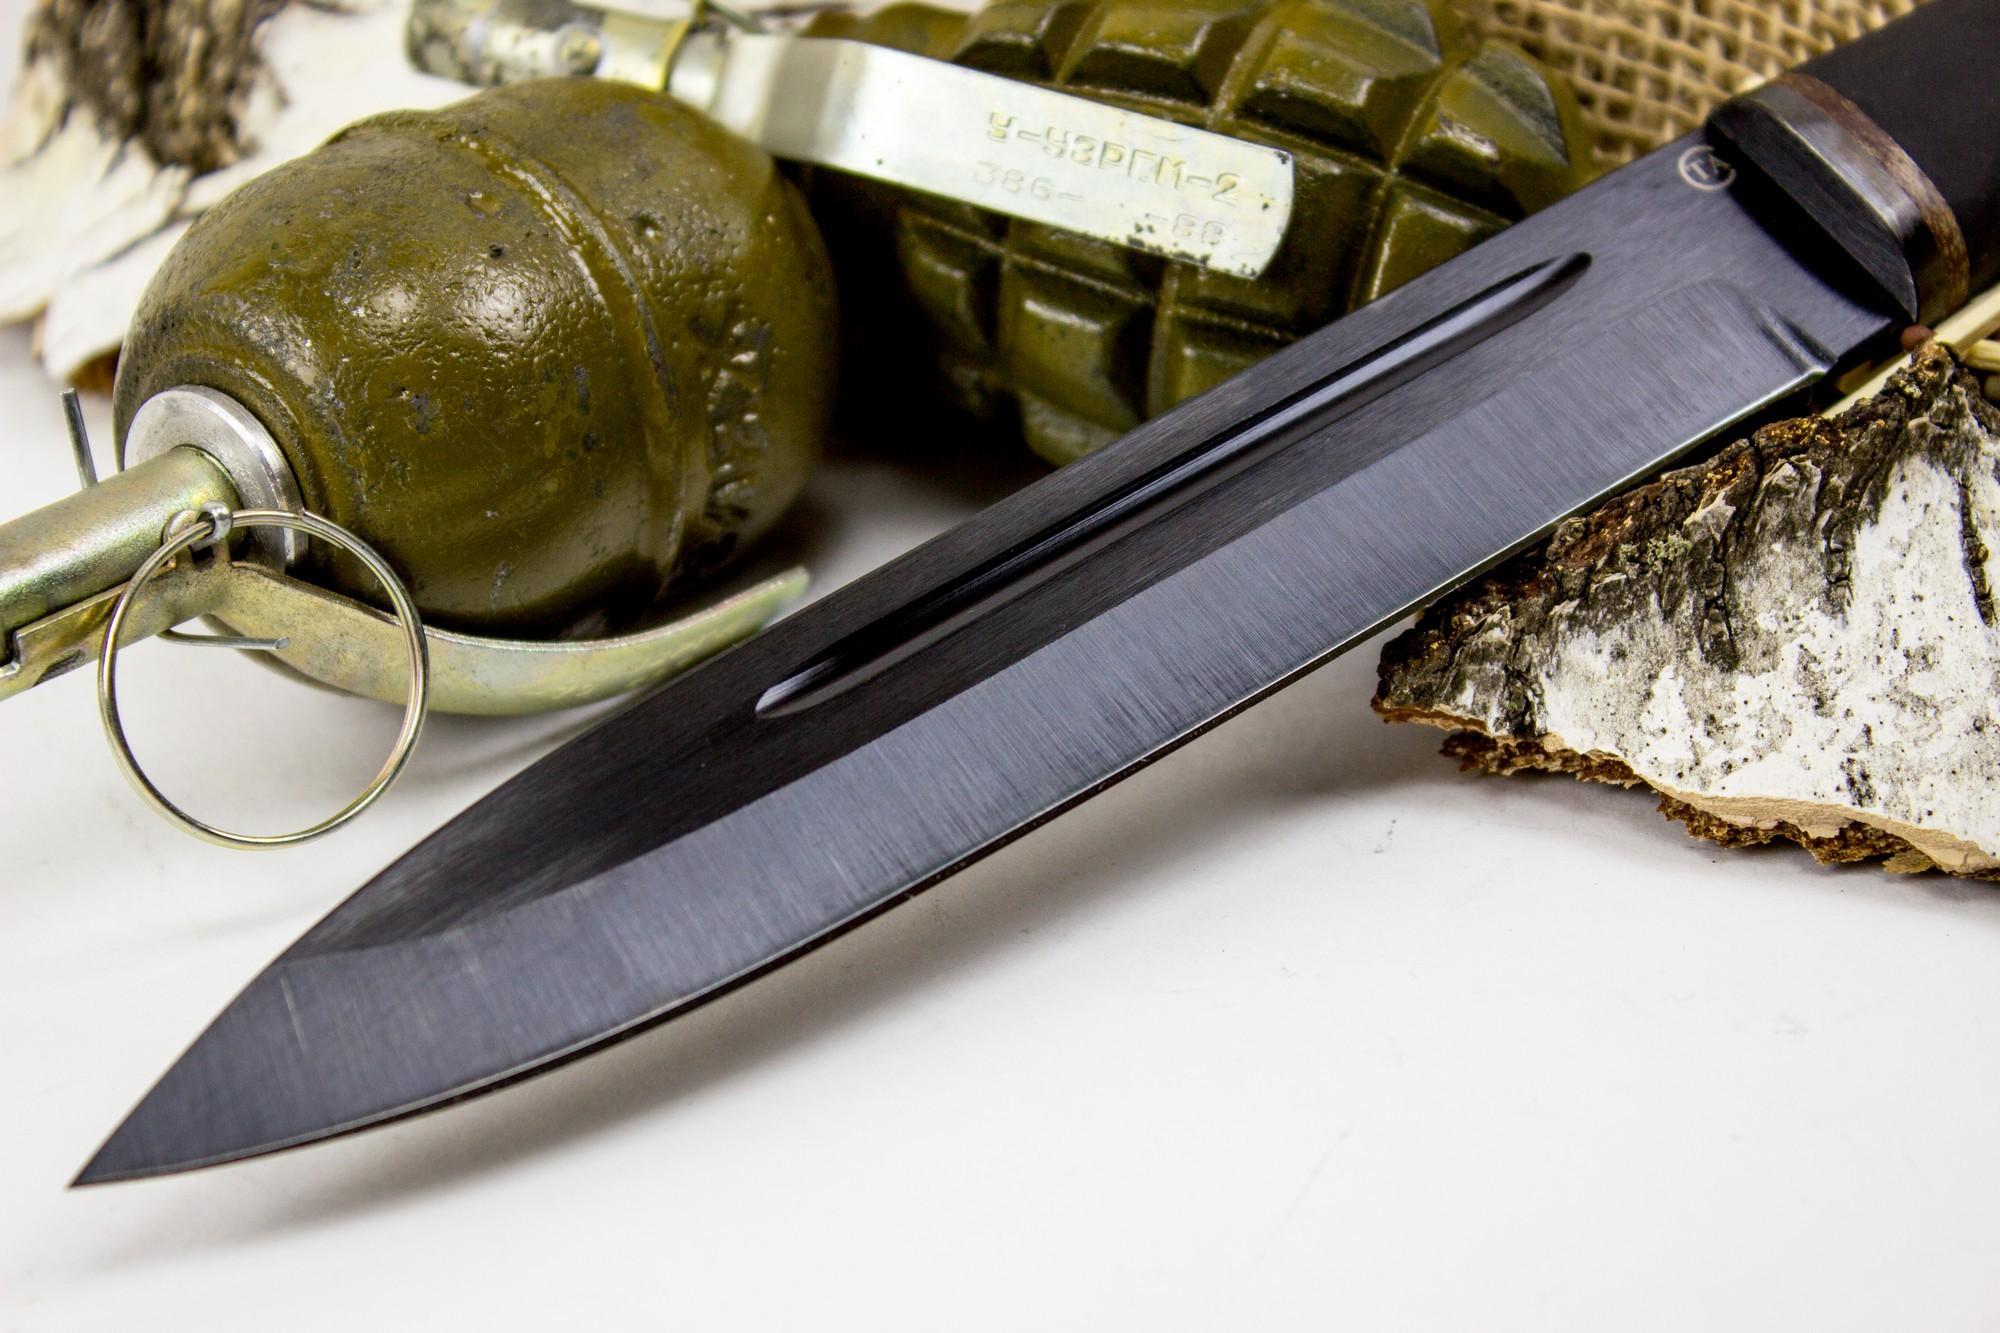 Фото 3 - Нож Горец-2, сталь 65Г, резина от Титов и Солдатова